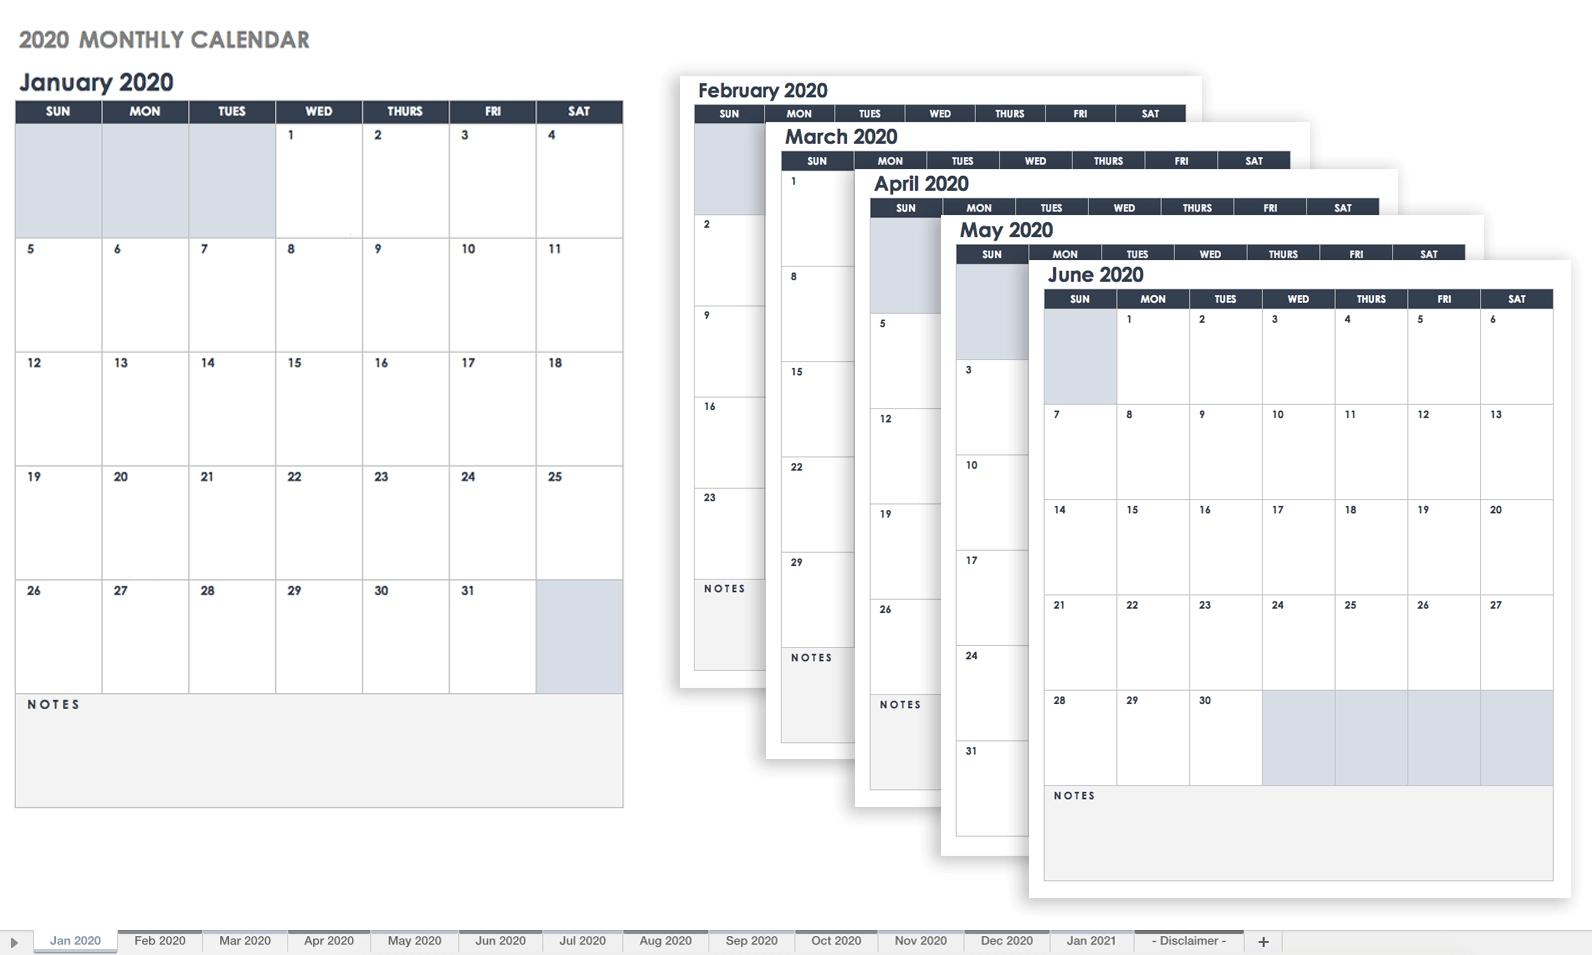 Free Google Calendar Templates | Smartsheet-2020 Employee Attendance Calendar Record Template Free